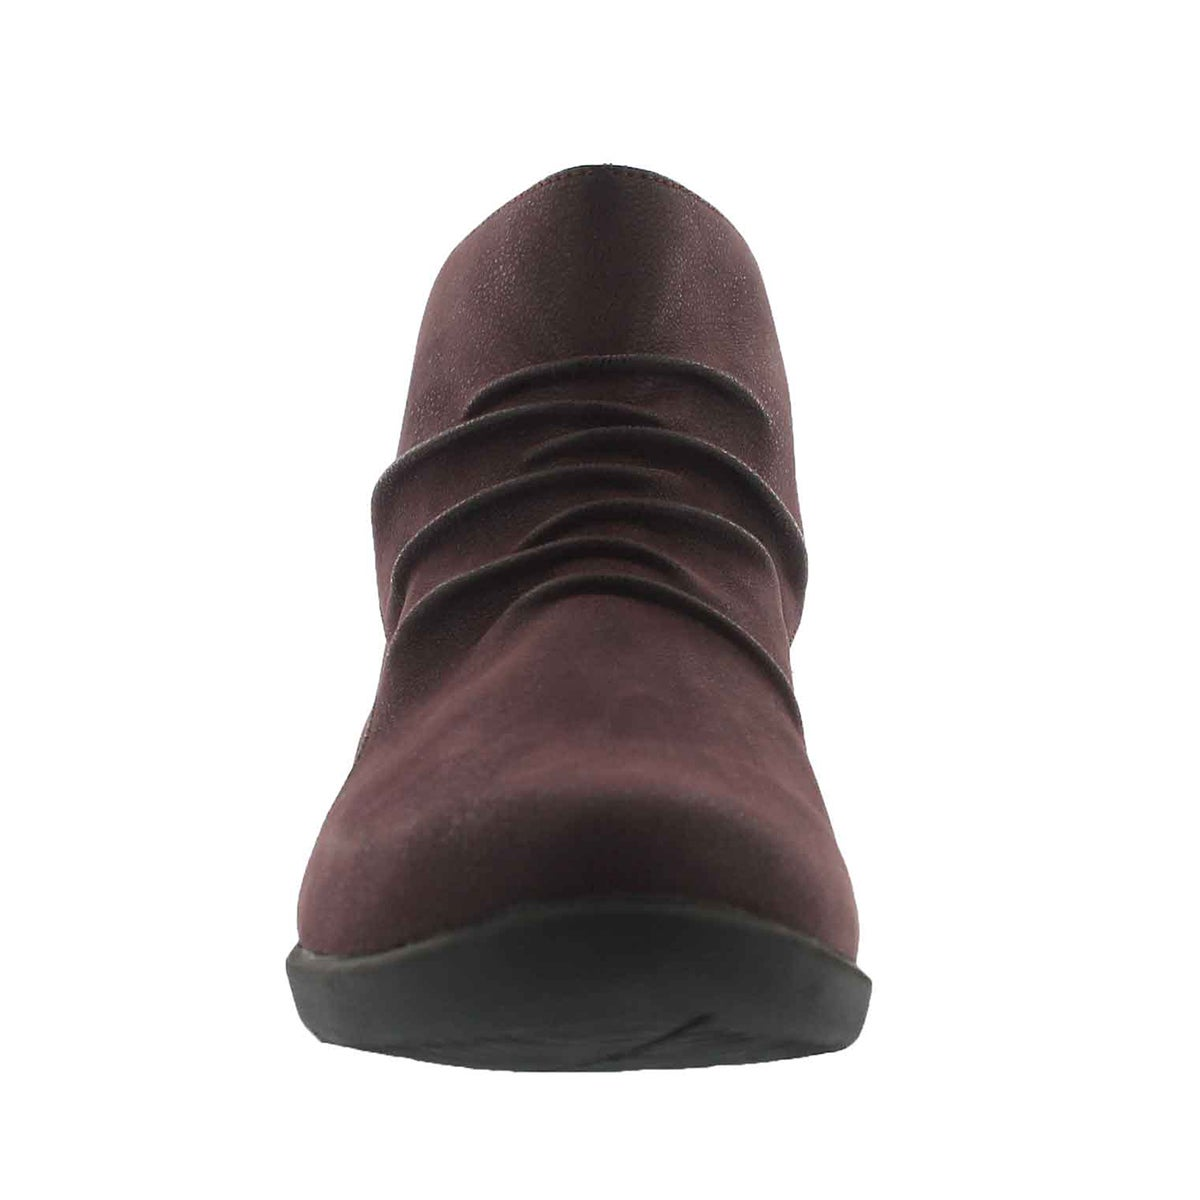 Lds Sillian Sway aubergine slip on boot